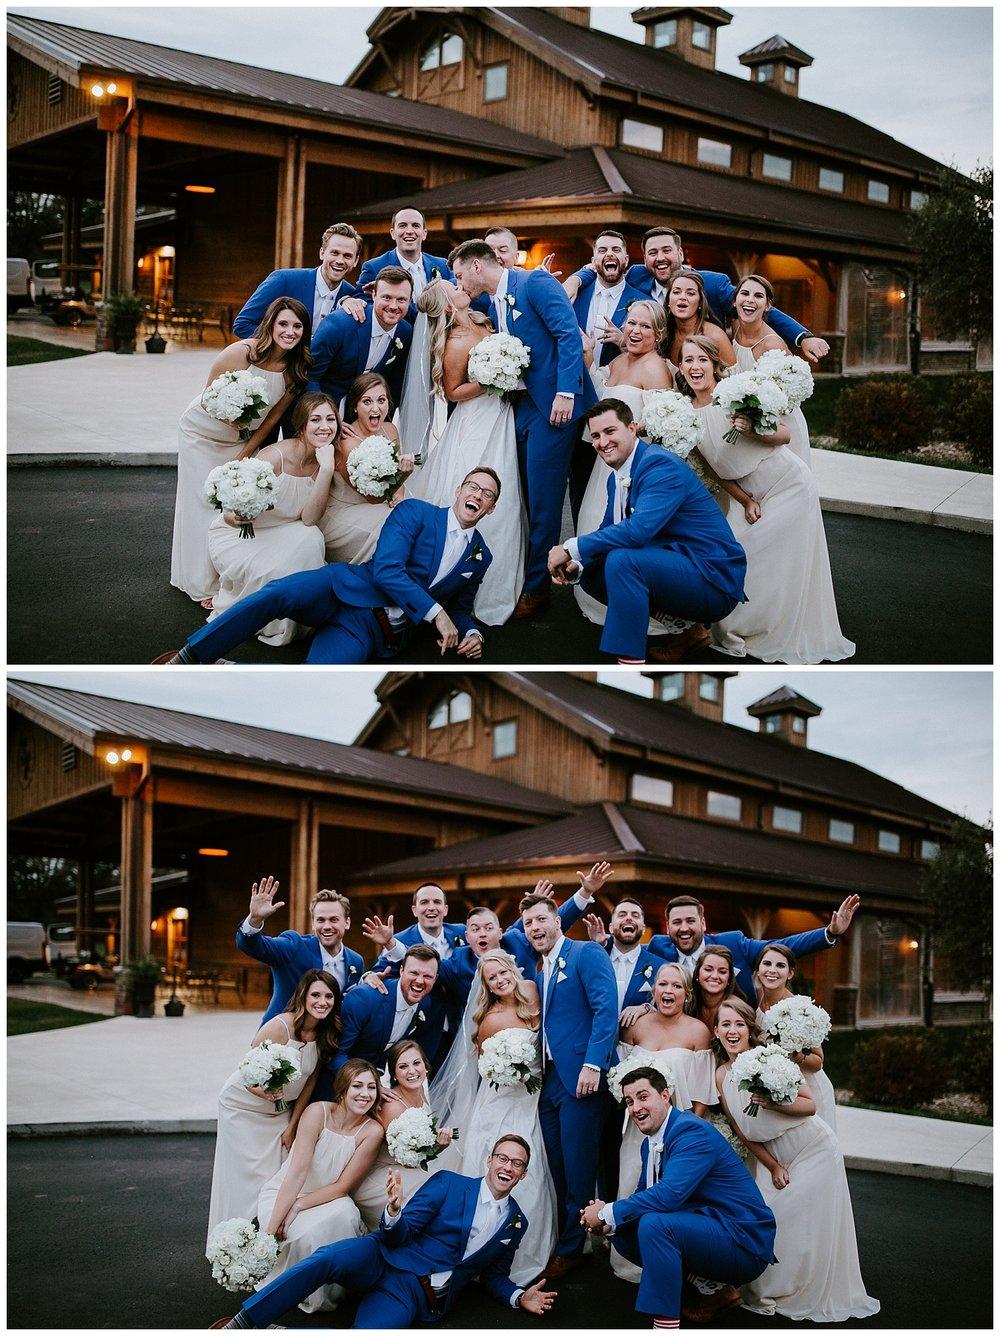 classy-wedding-sycamore_farms-nashville-tn2019-01-22_0065.jpg